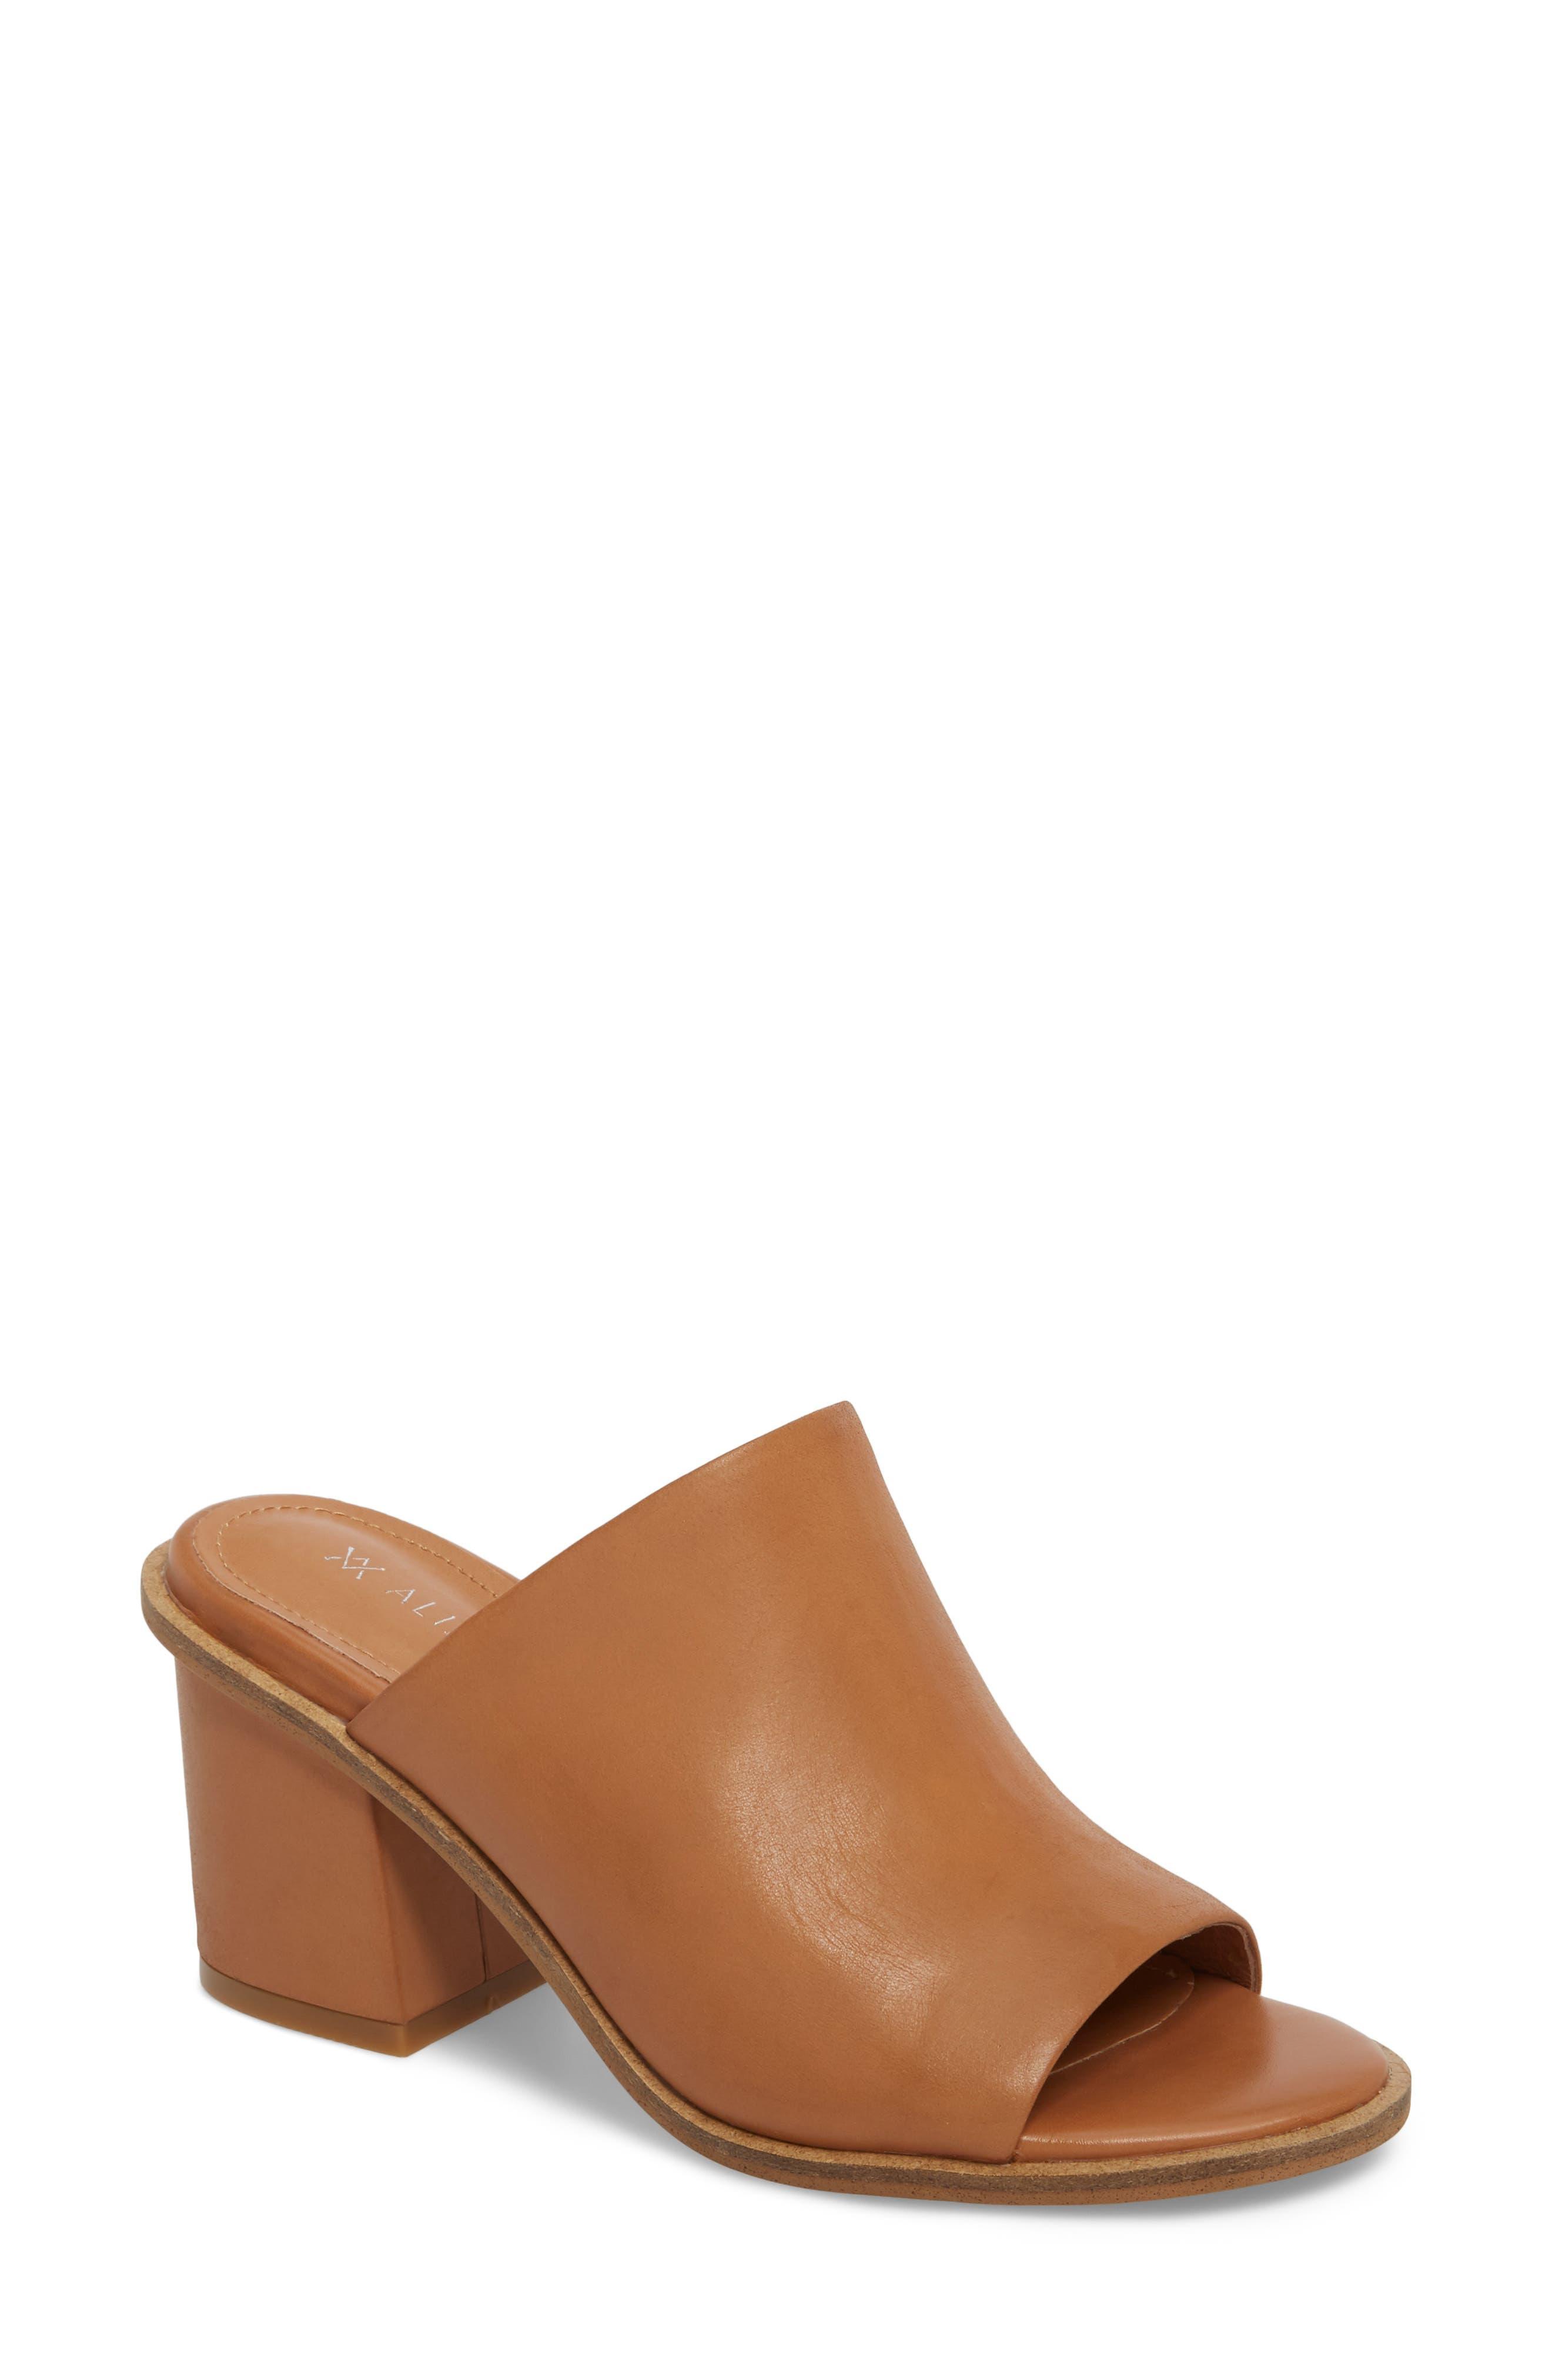 801380f9c27 Women's Alias Mae Shoes | Nordstrom